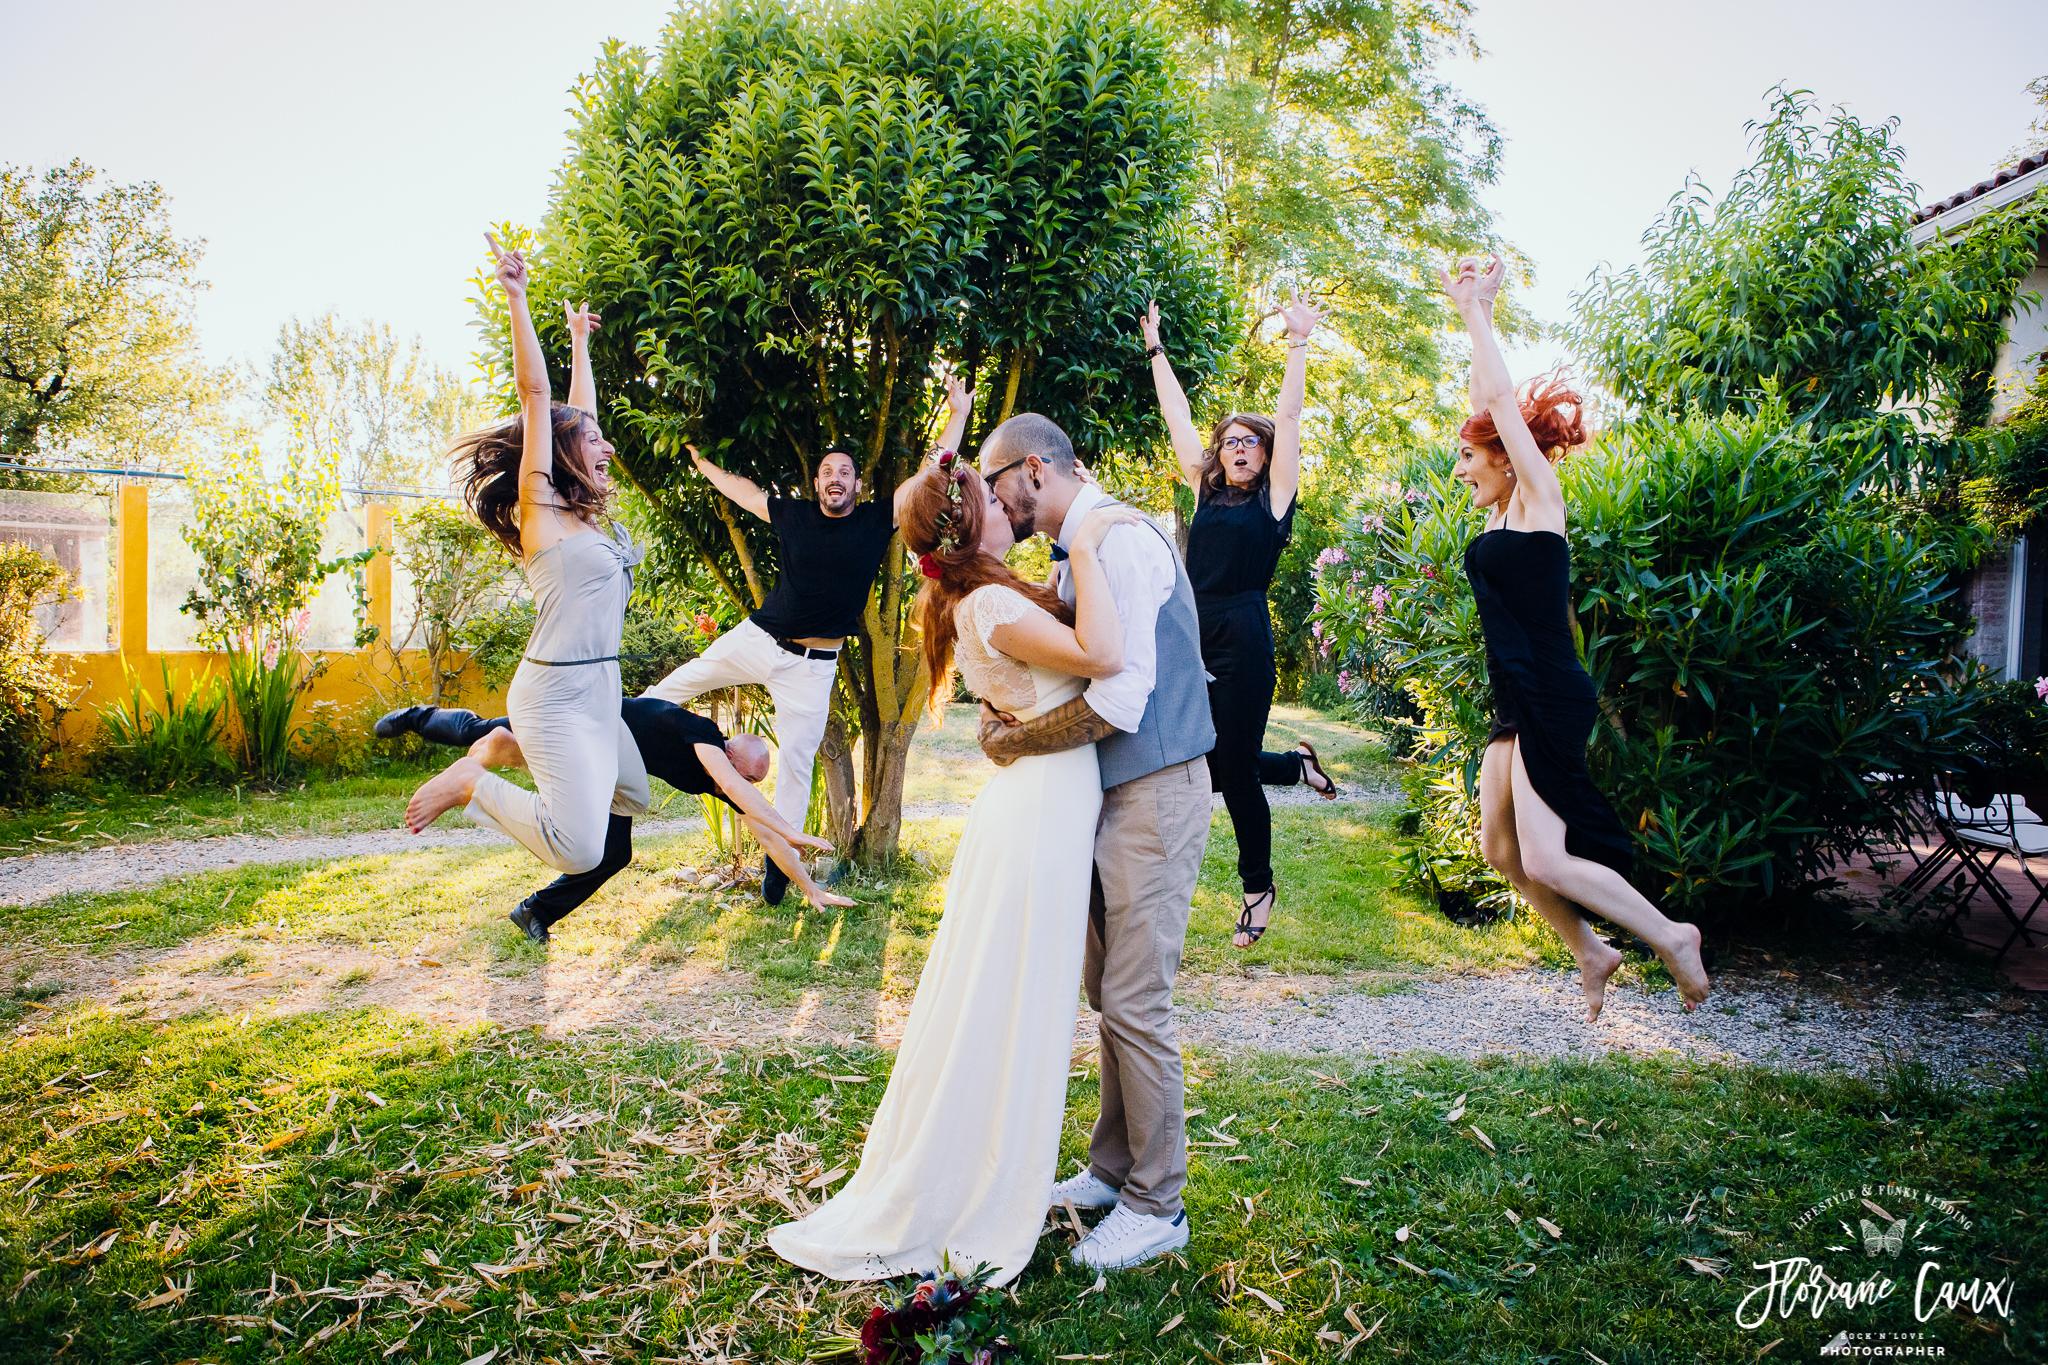 photographe-mariage-toulouse-rocknroll-maries-tatoues-floriane-caux-106